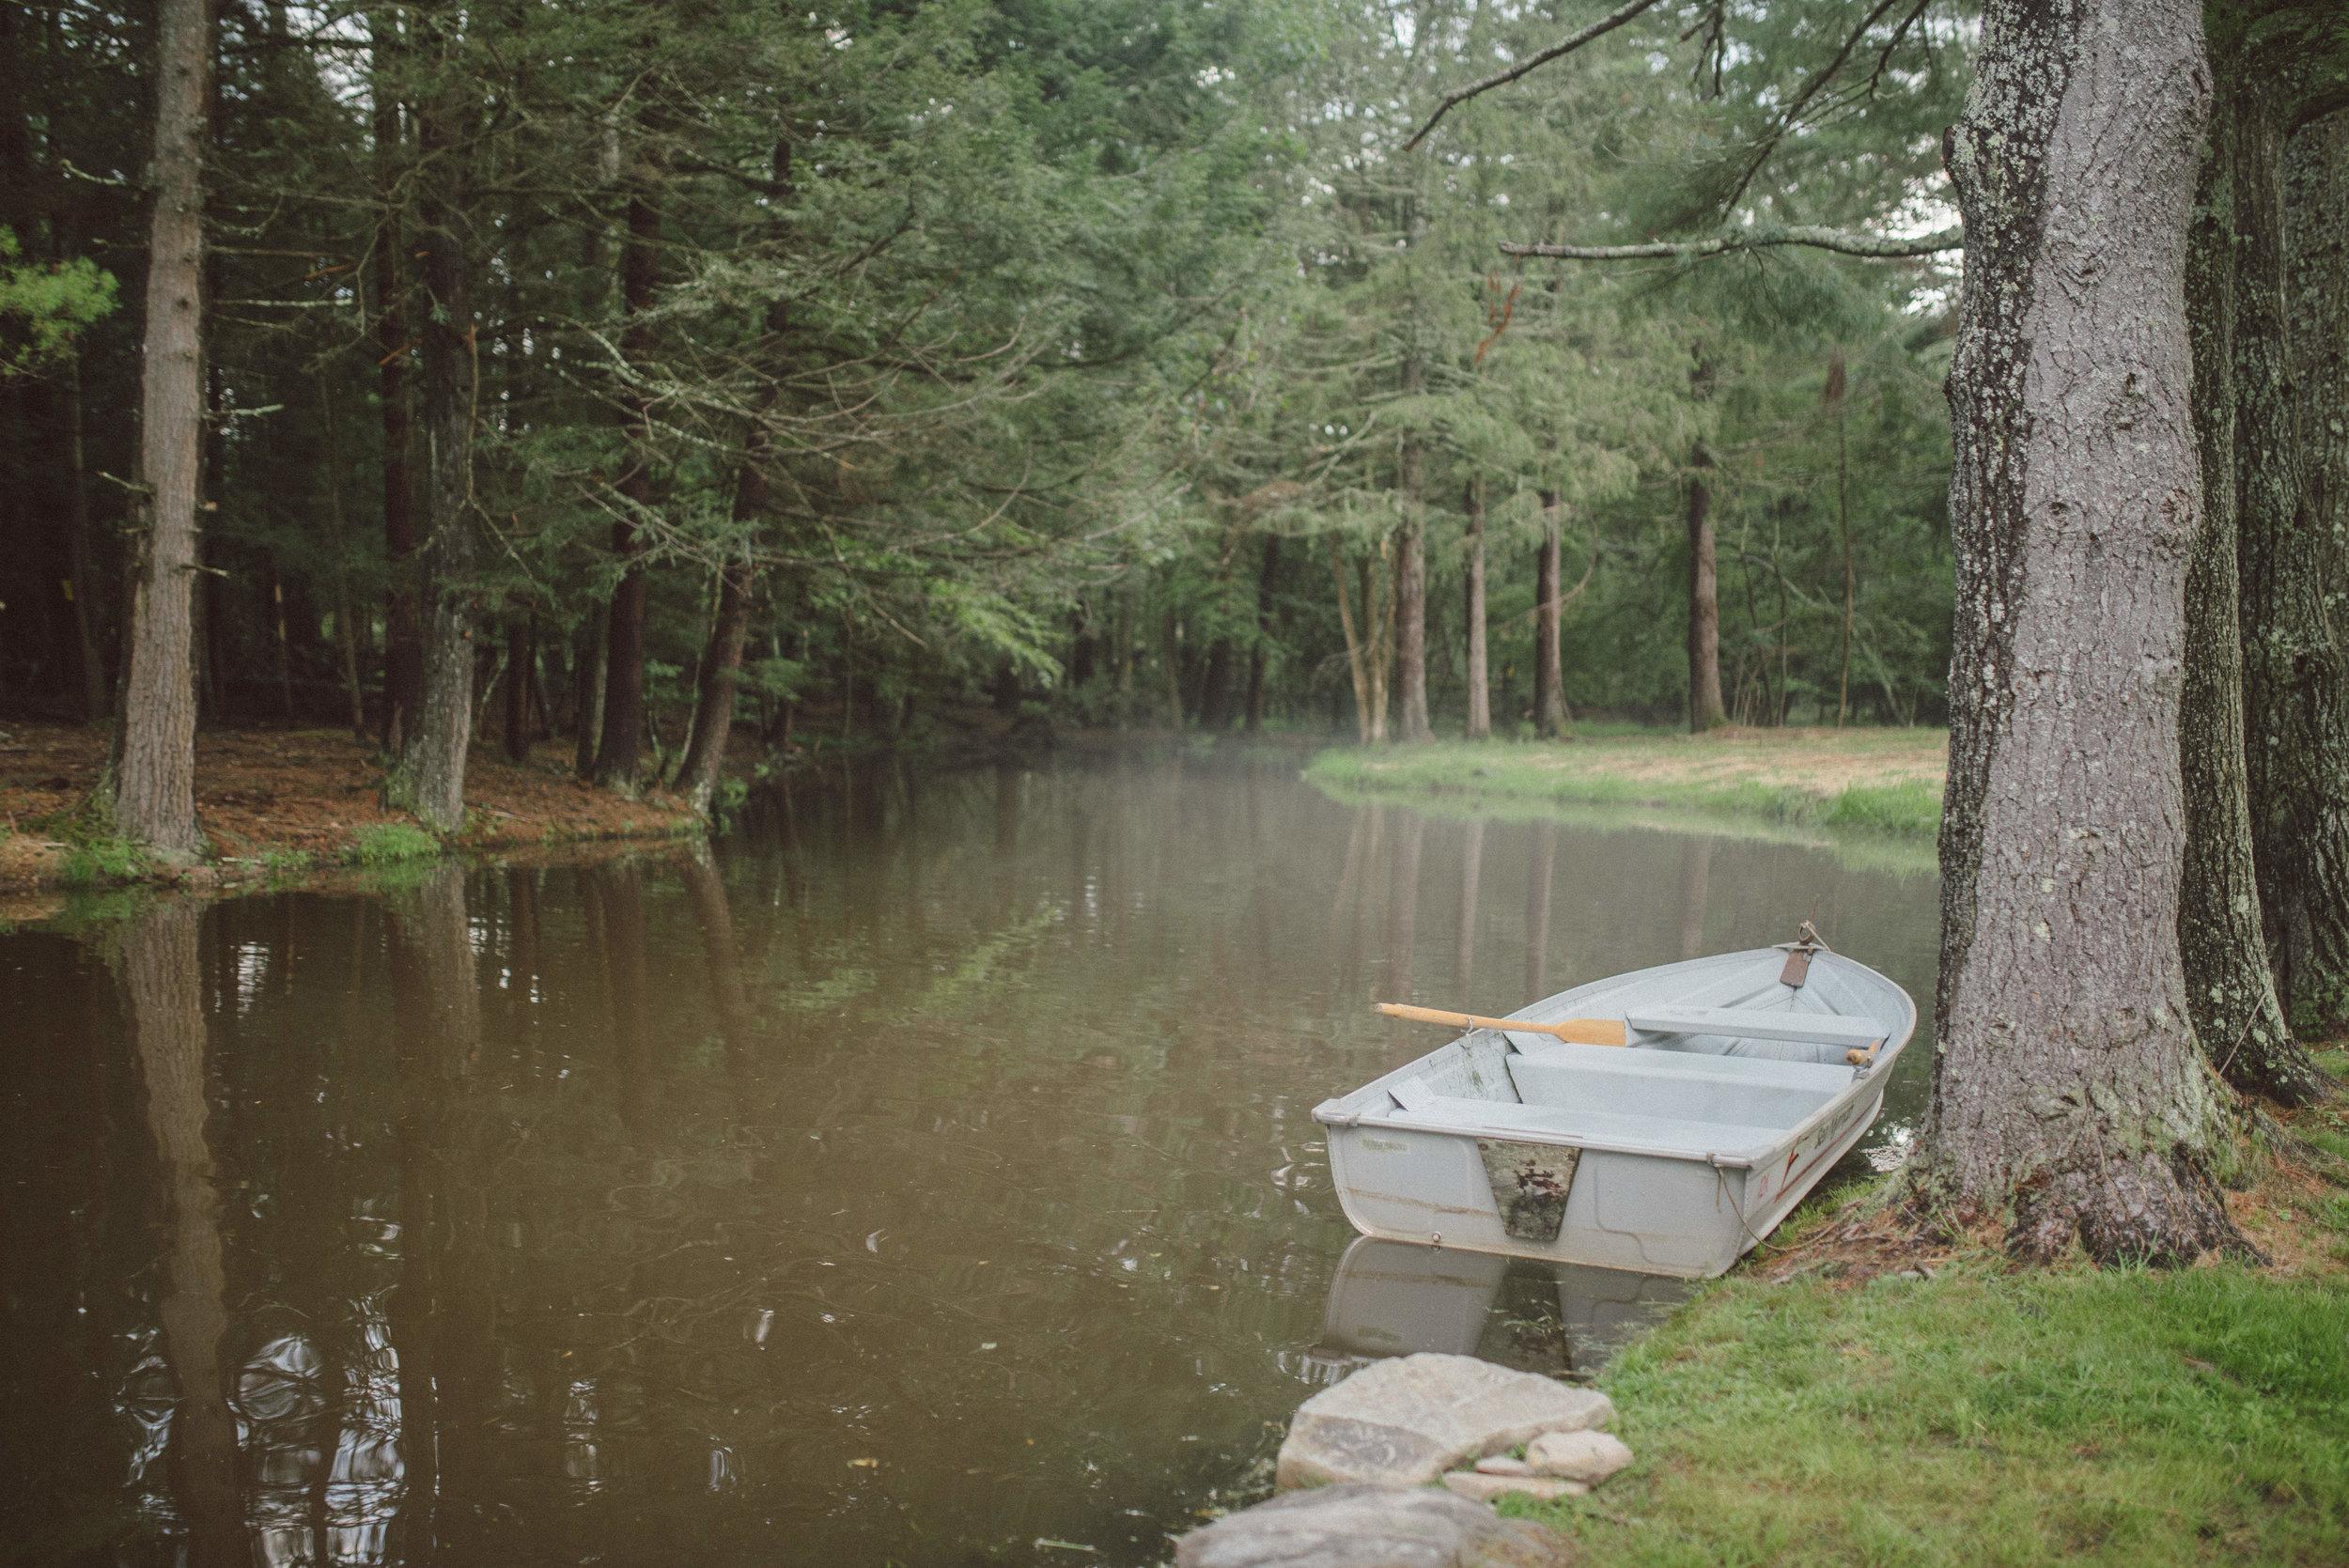 Floating-farmhouse-2018-summer-content-lifestyle-REV1-0004.jpg